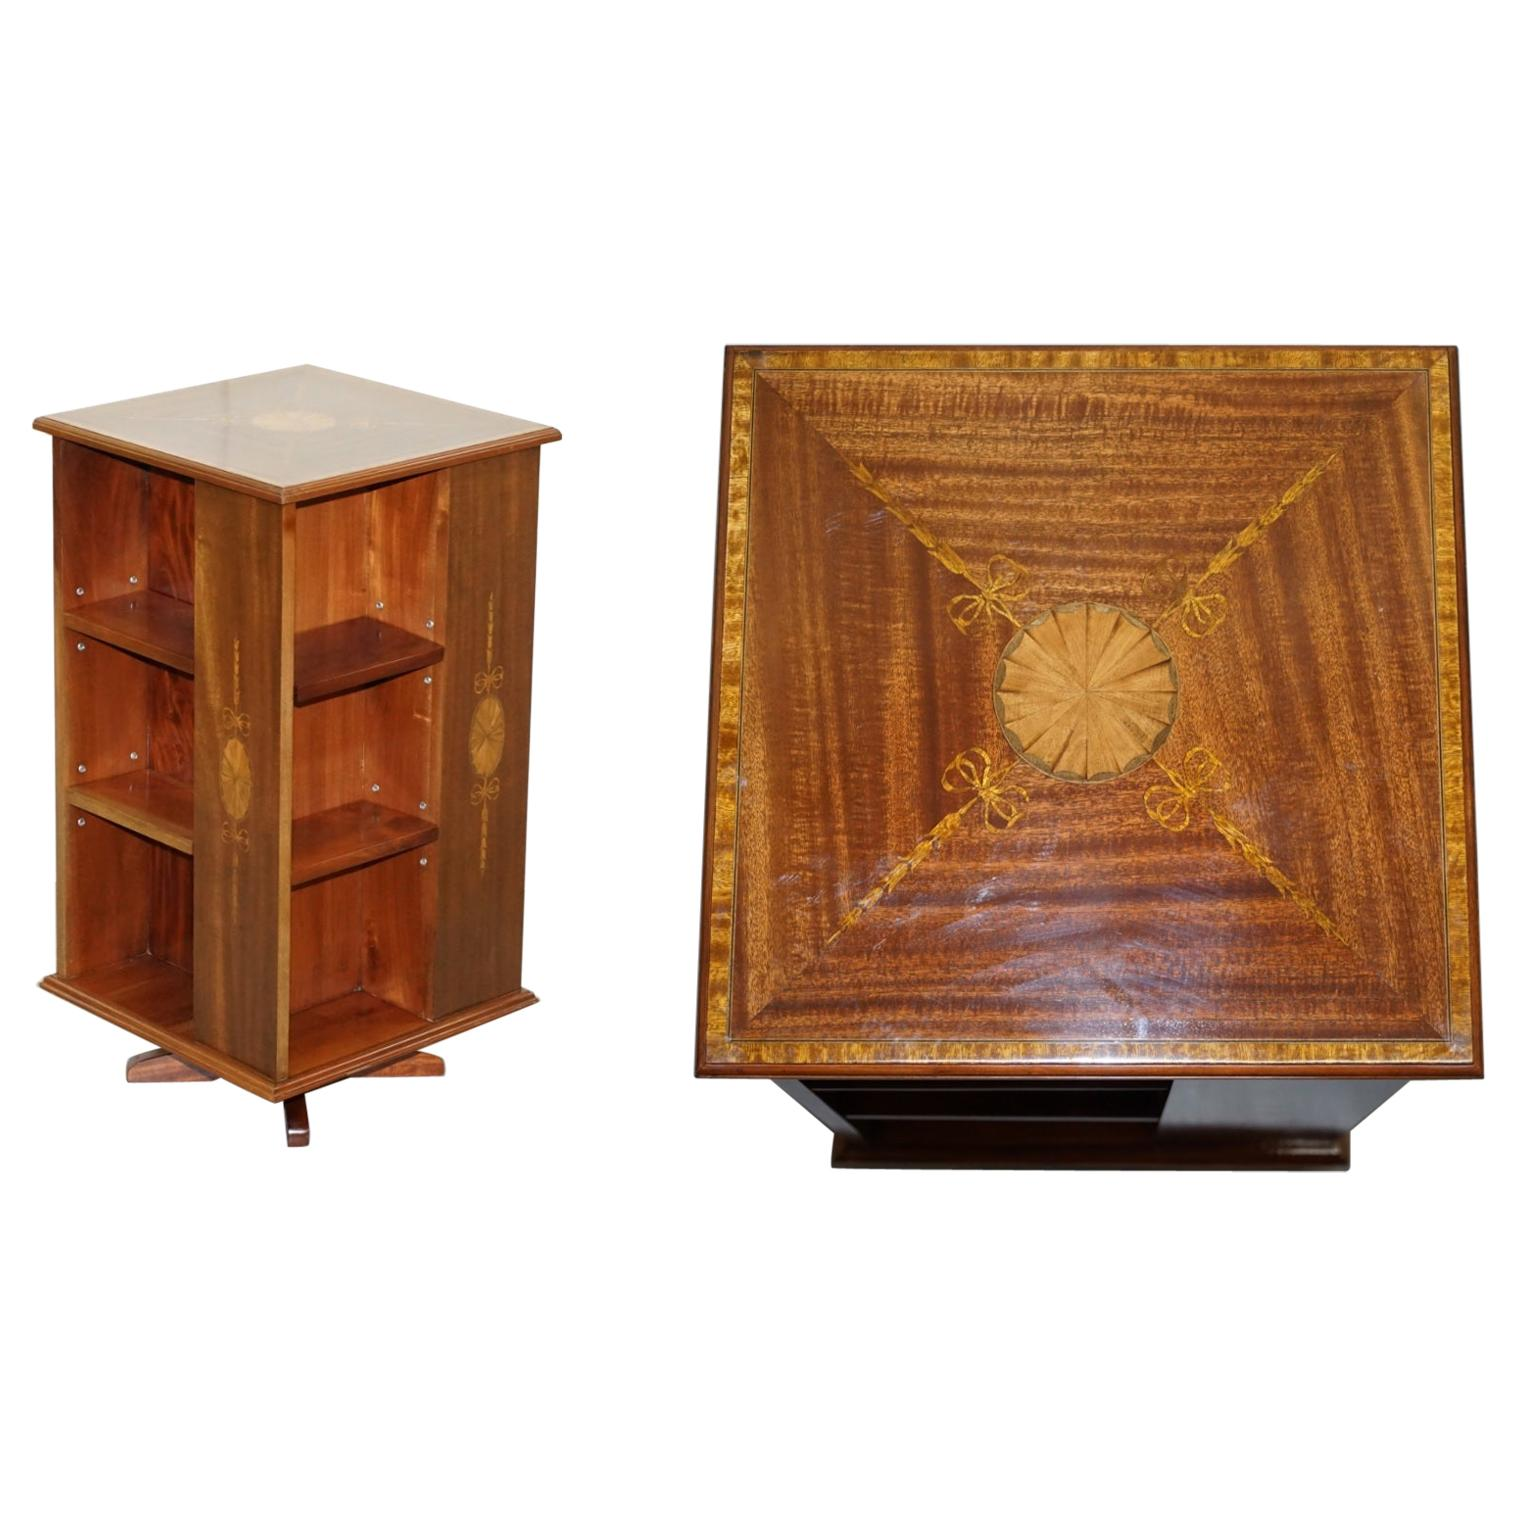 Edwardian Burr Walnut & Mahogany Revolving Bookcases Sheraton Inlaid, circa 1900